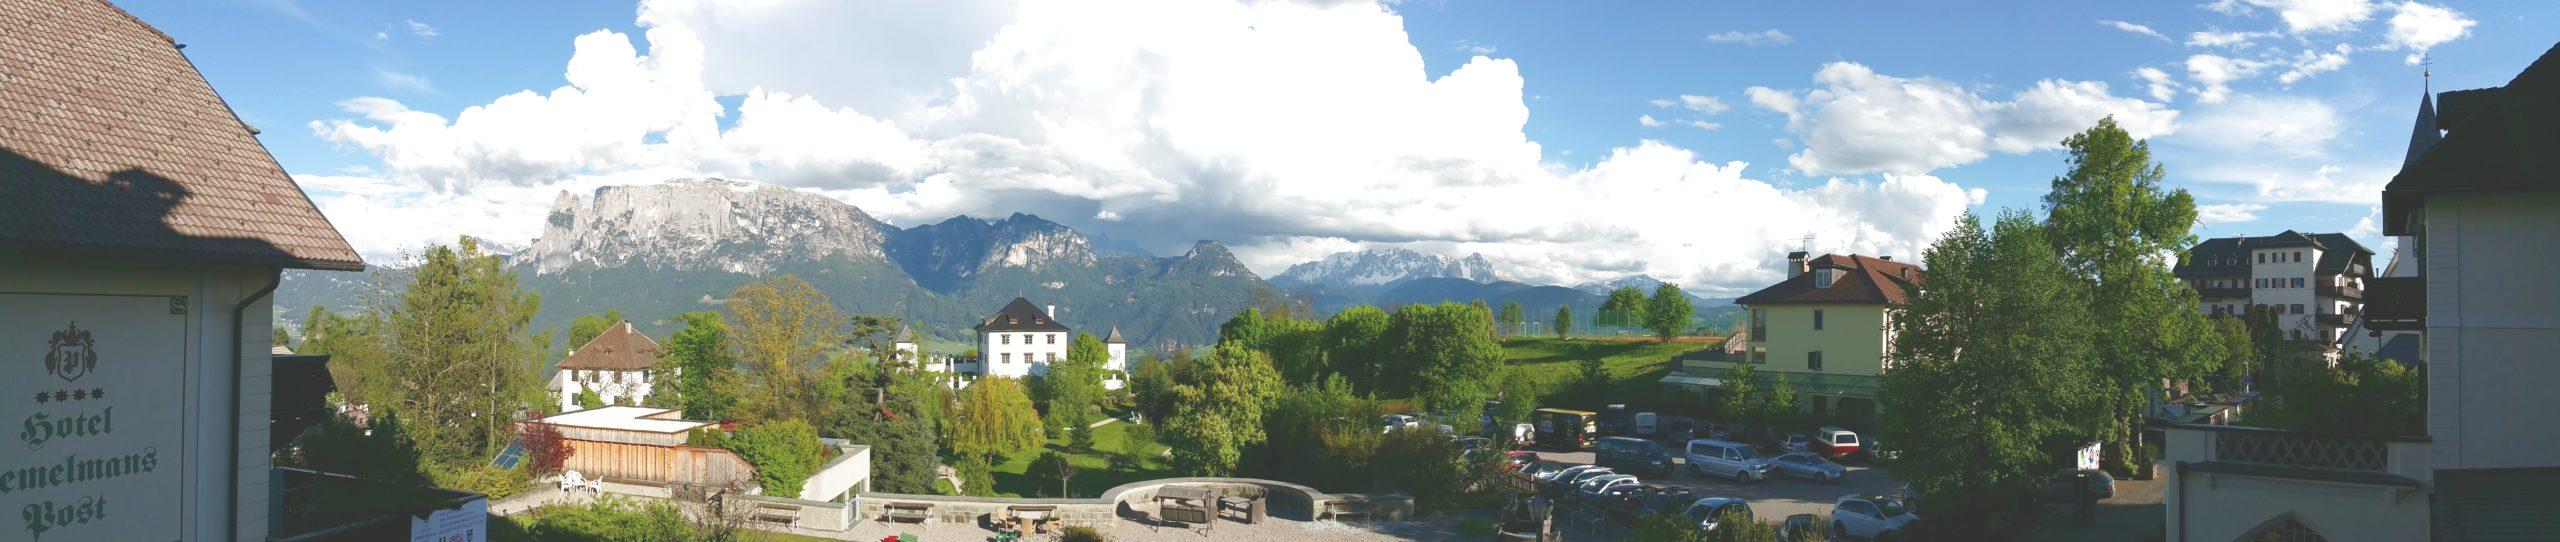 Panorama_Collalbo